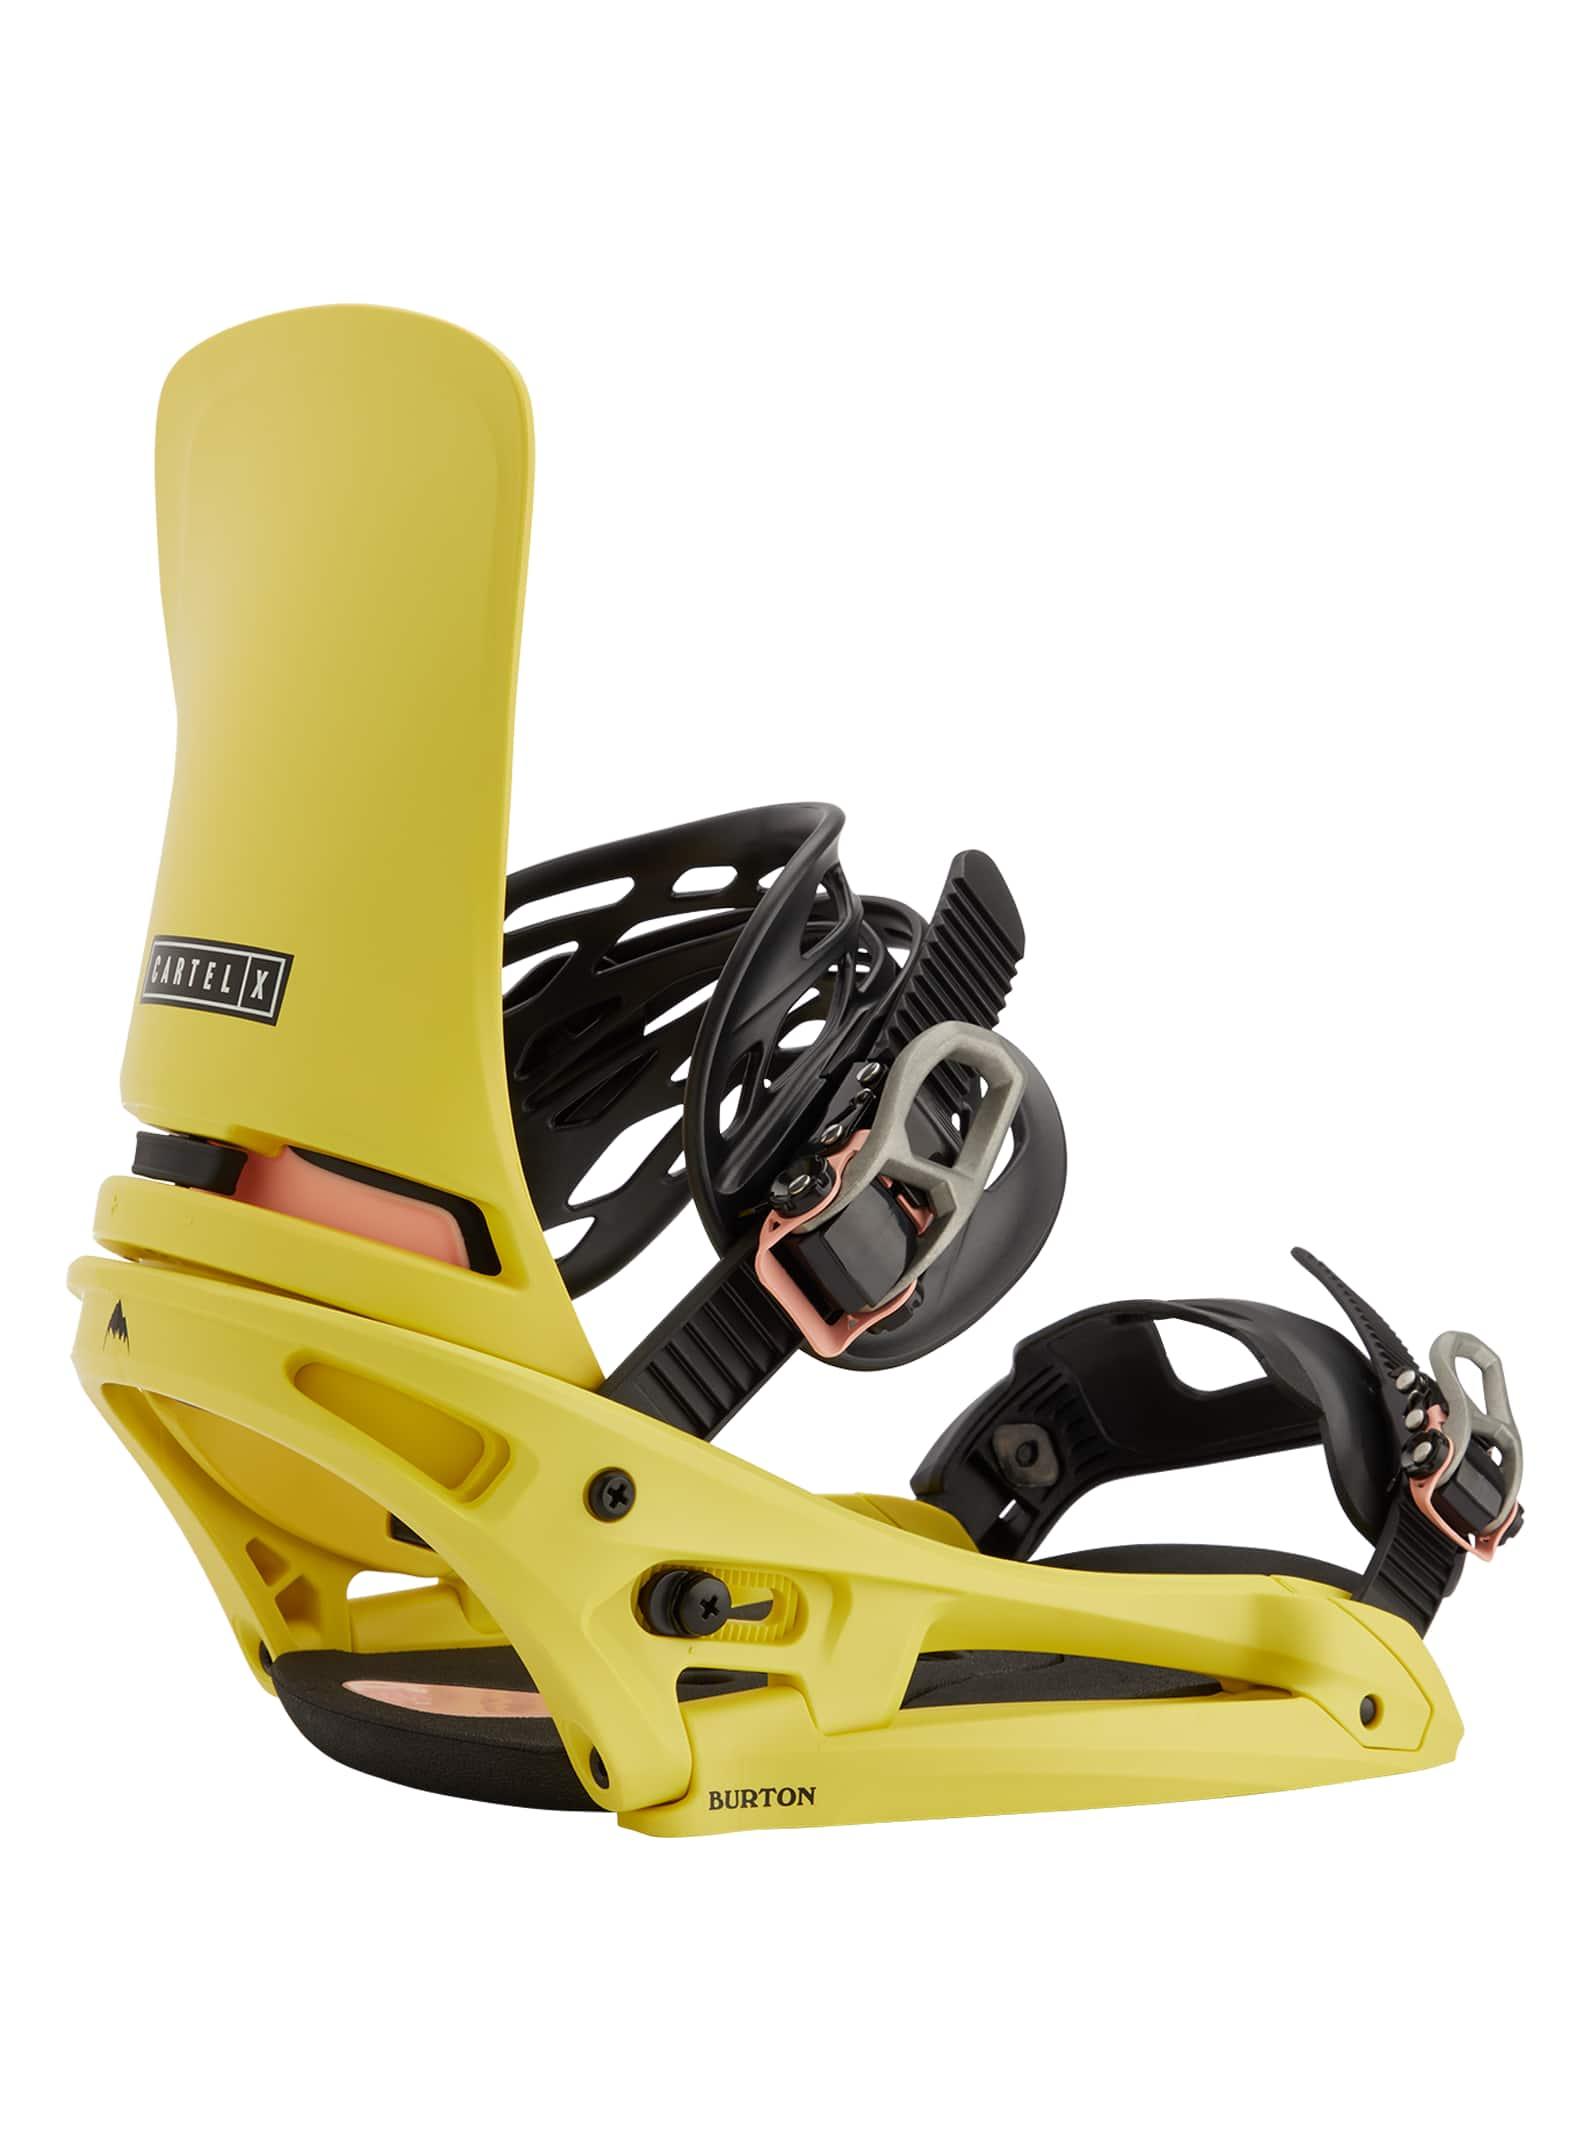 Details about  /Burton Cartel X EST Men/'s Snowboard Binding Channel 2021 New